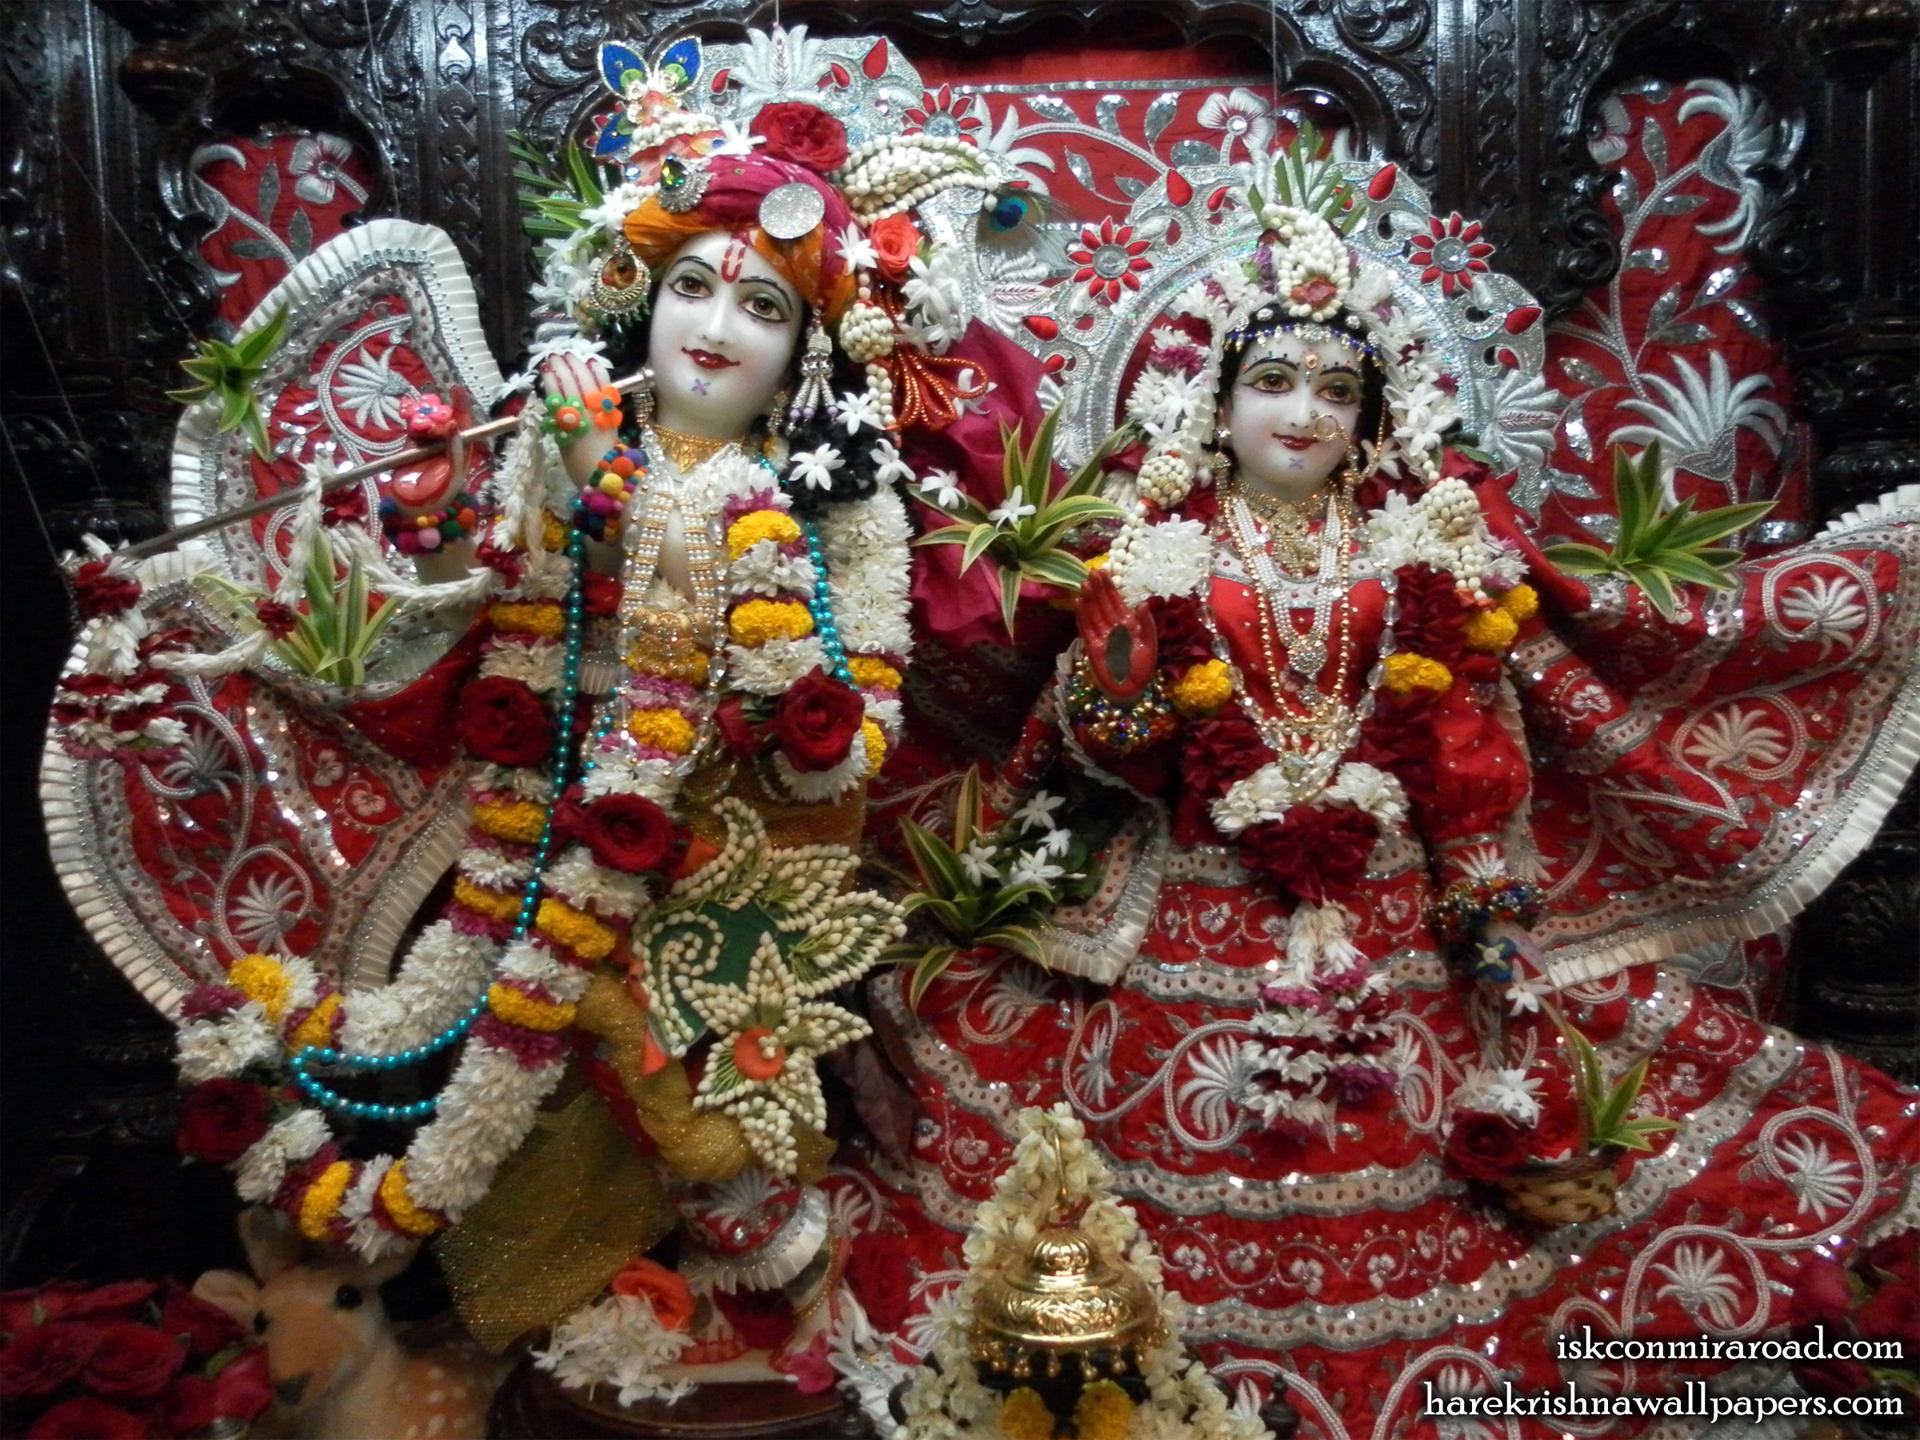 Sri Sri Radha Giridhari Wallpaper (010) Size 1920x1440 Download